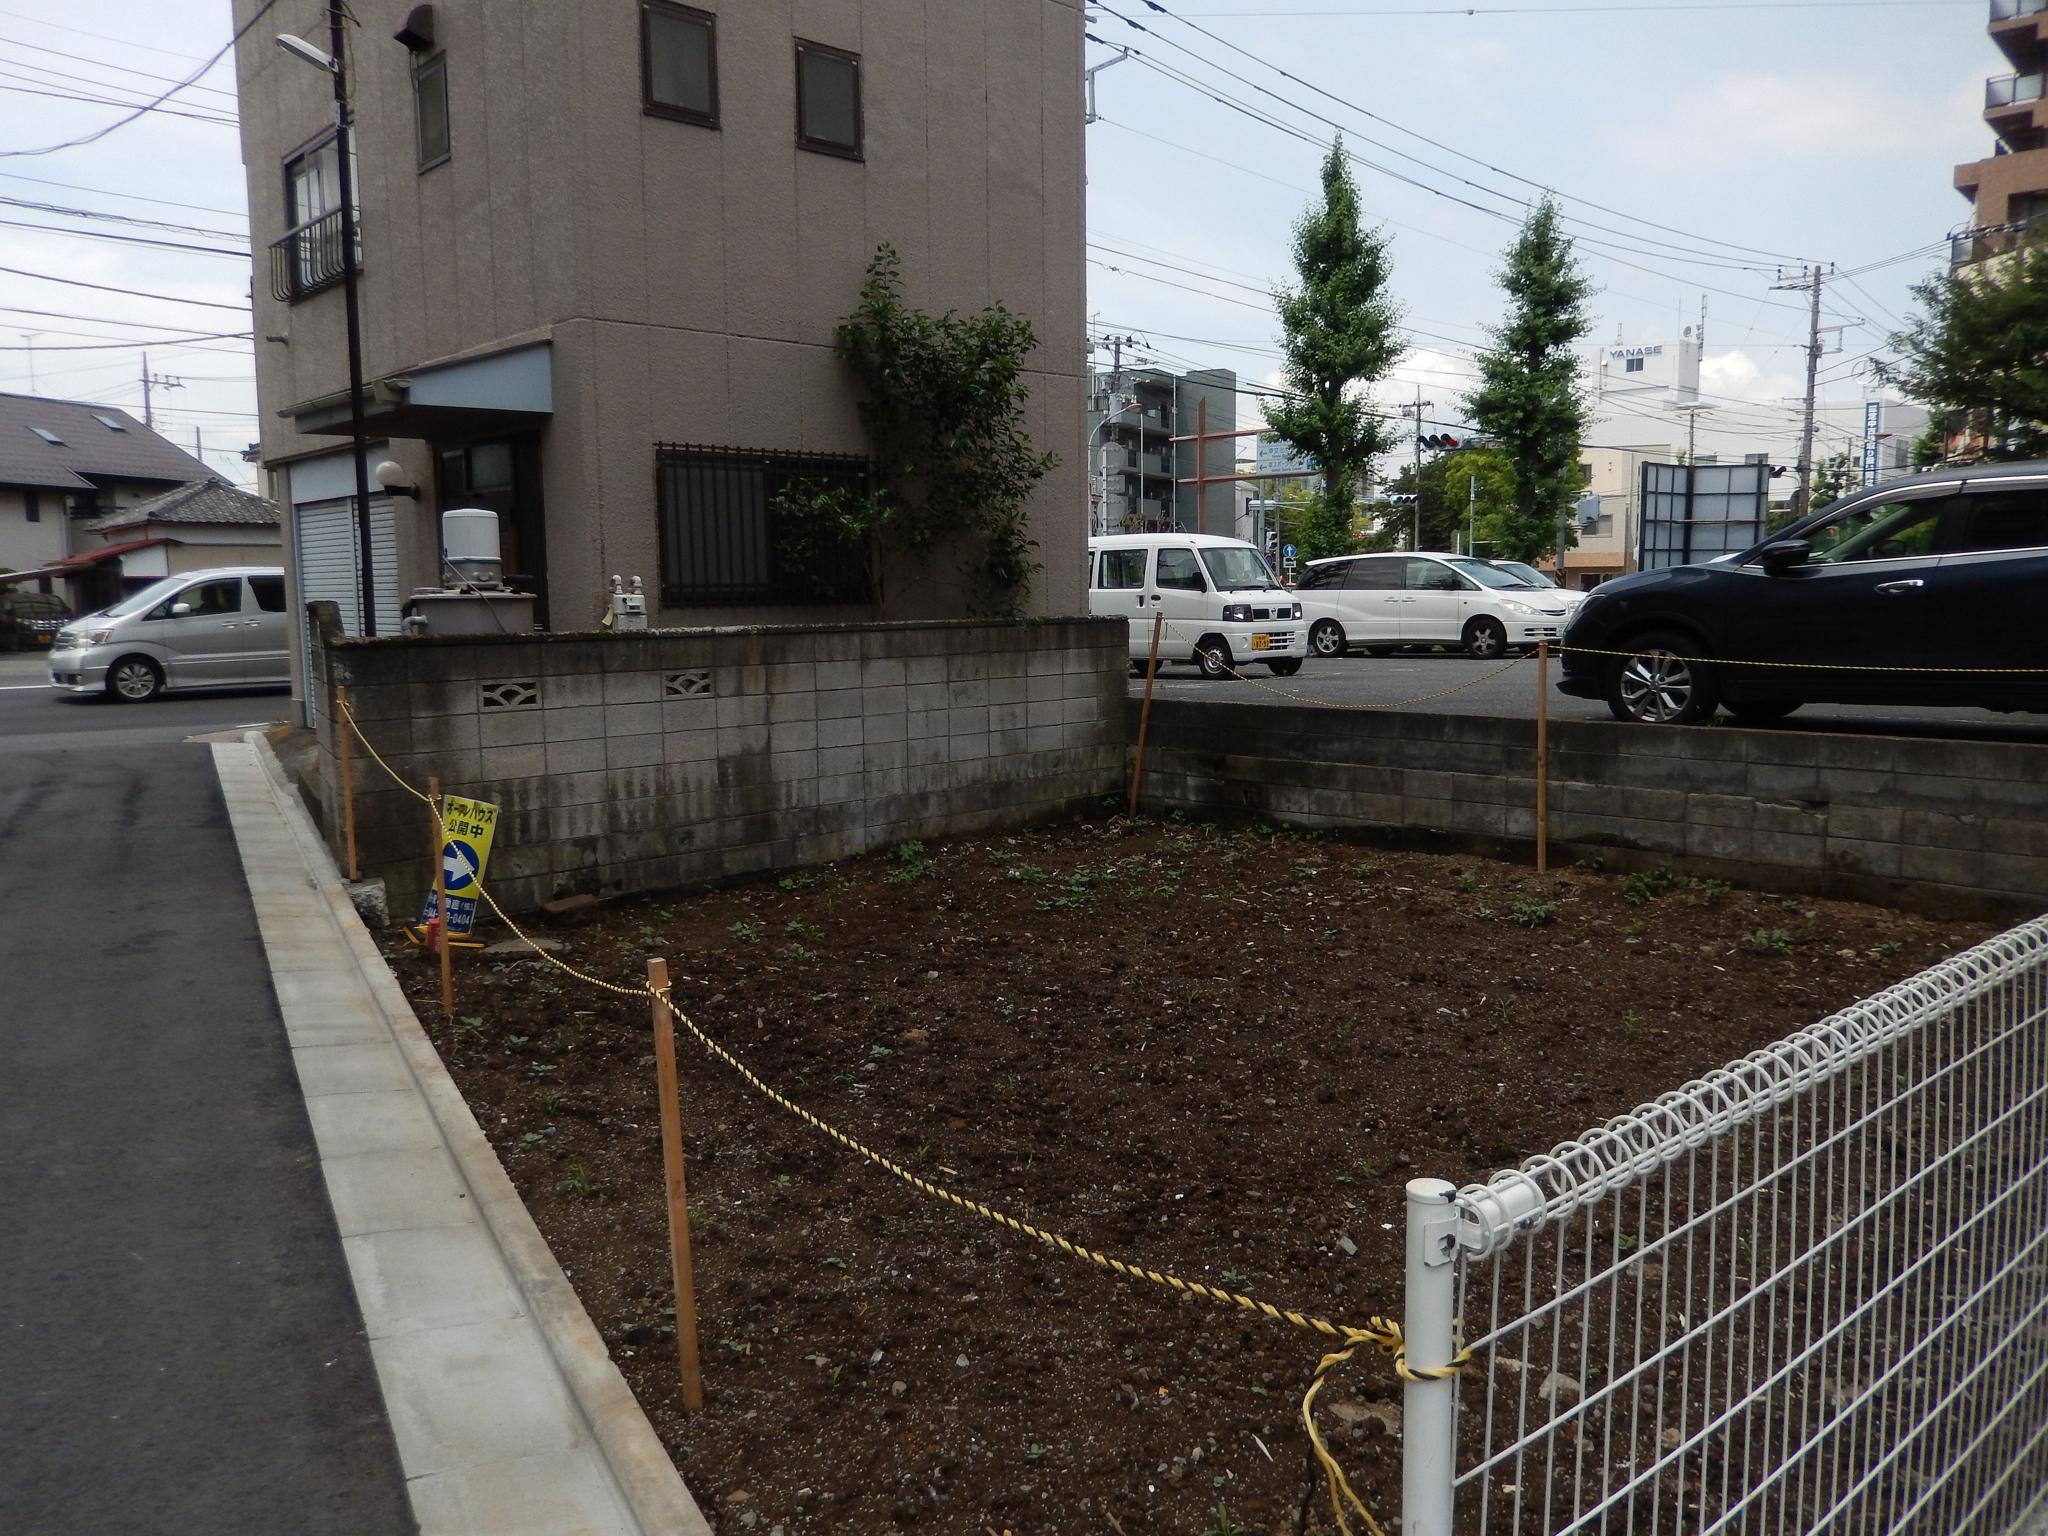 f:id:ToshUeno:20160710103209j:plain